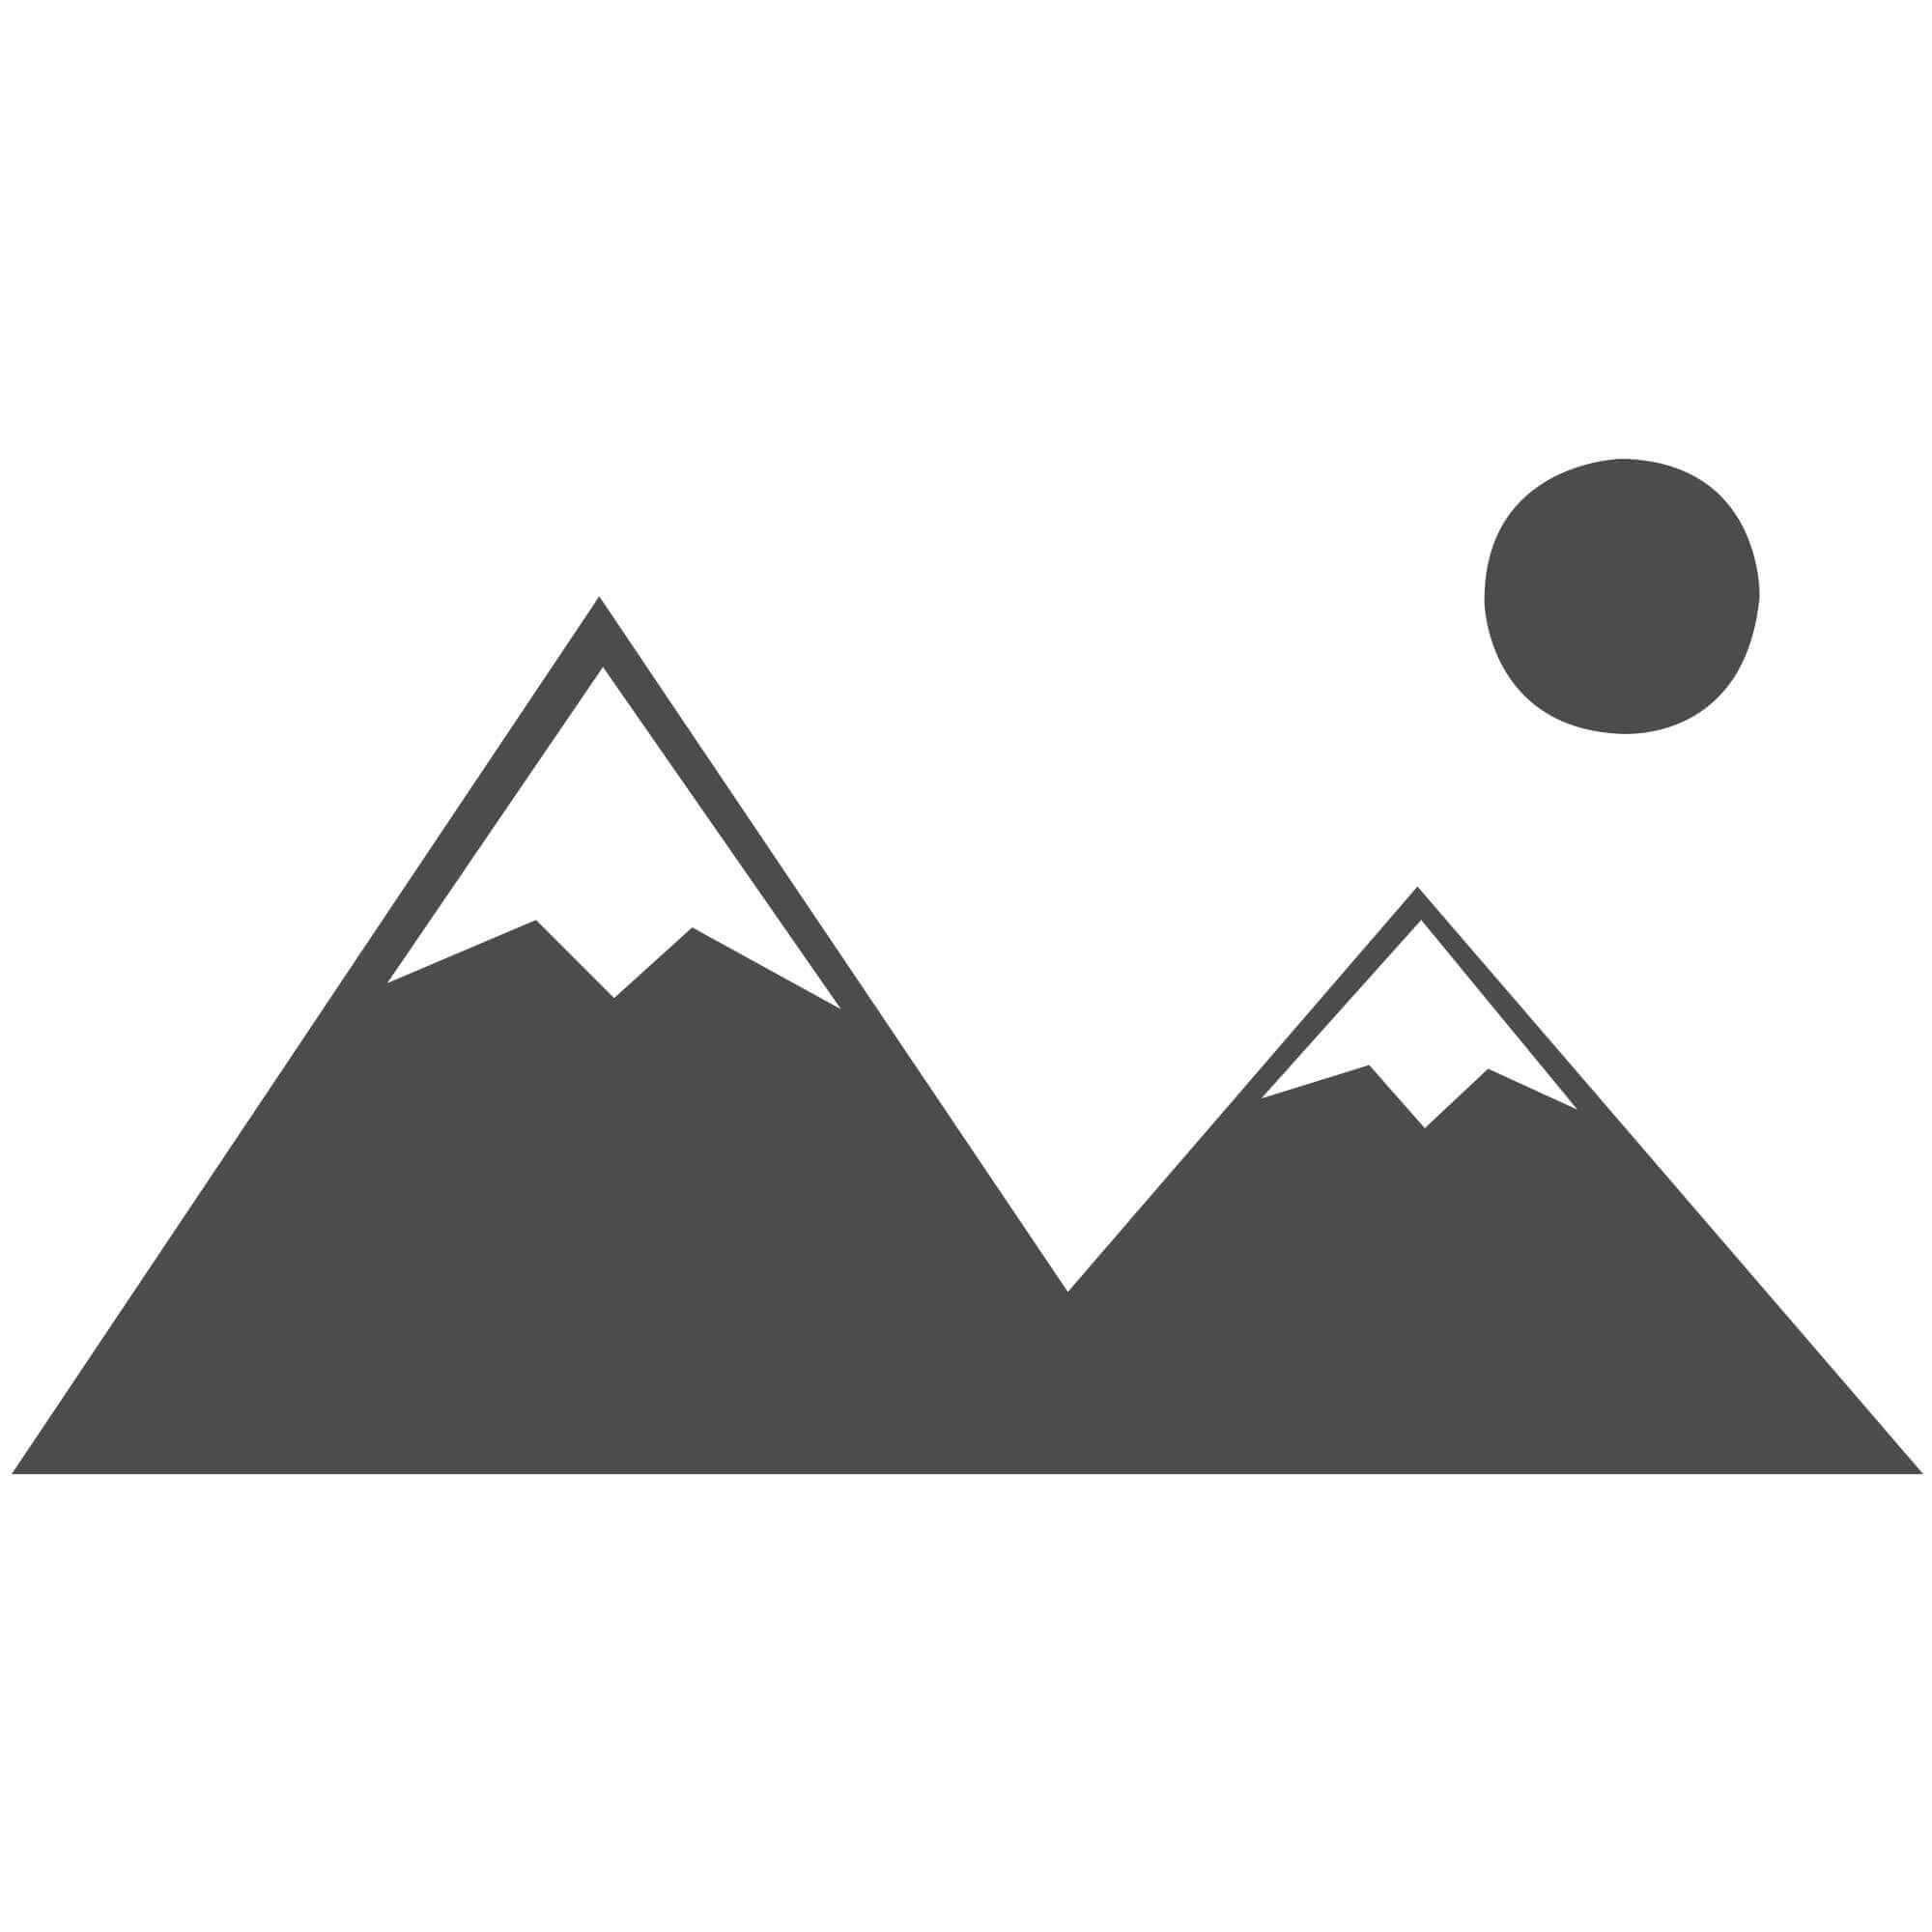 "Velvet Bijoux Rug - Beige Brown - Size 120 x 170 cm (4' x 5'7"")"